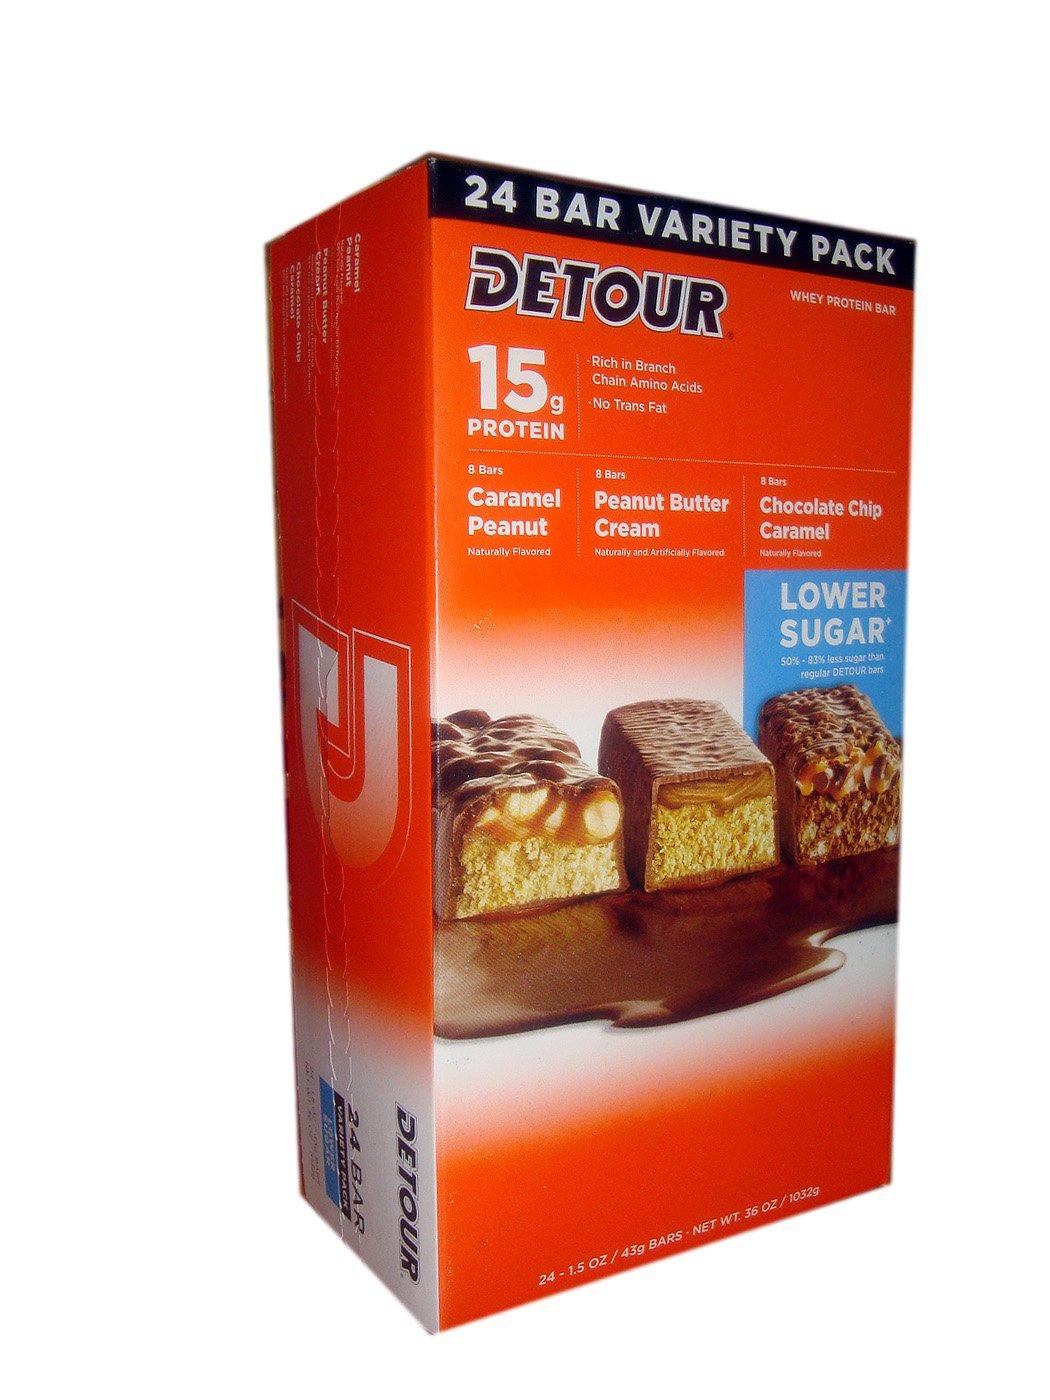 Detour lower sugar protein bars reviews